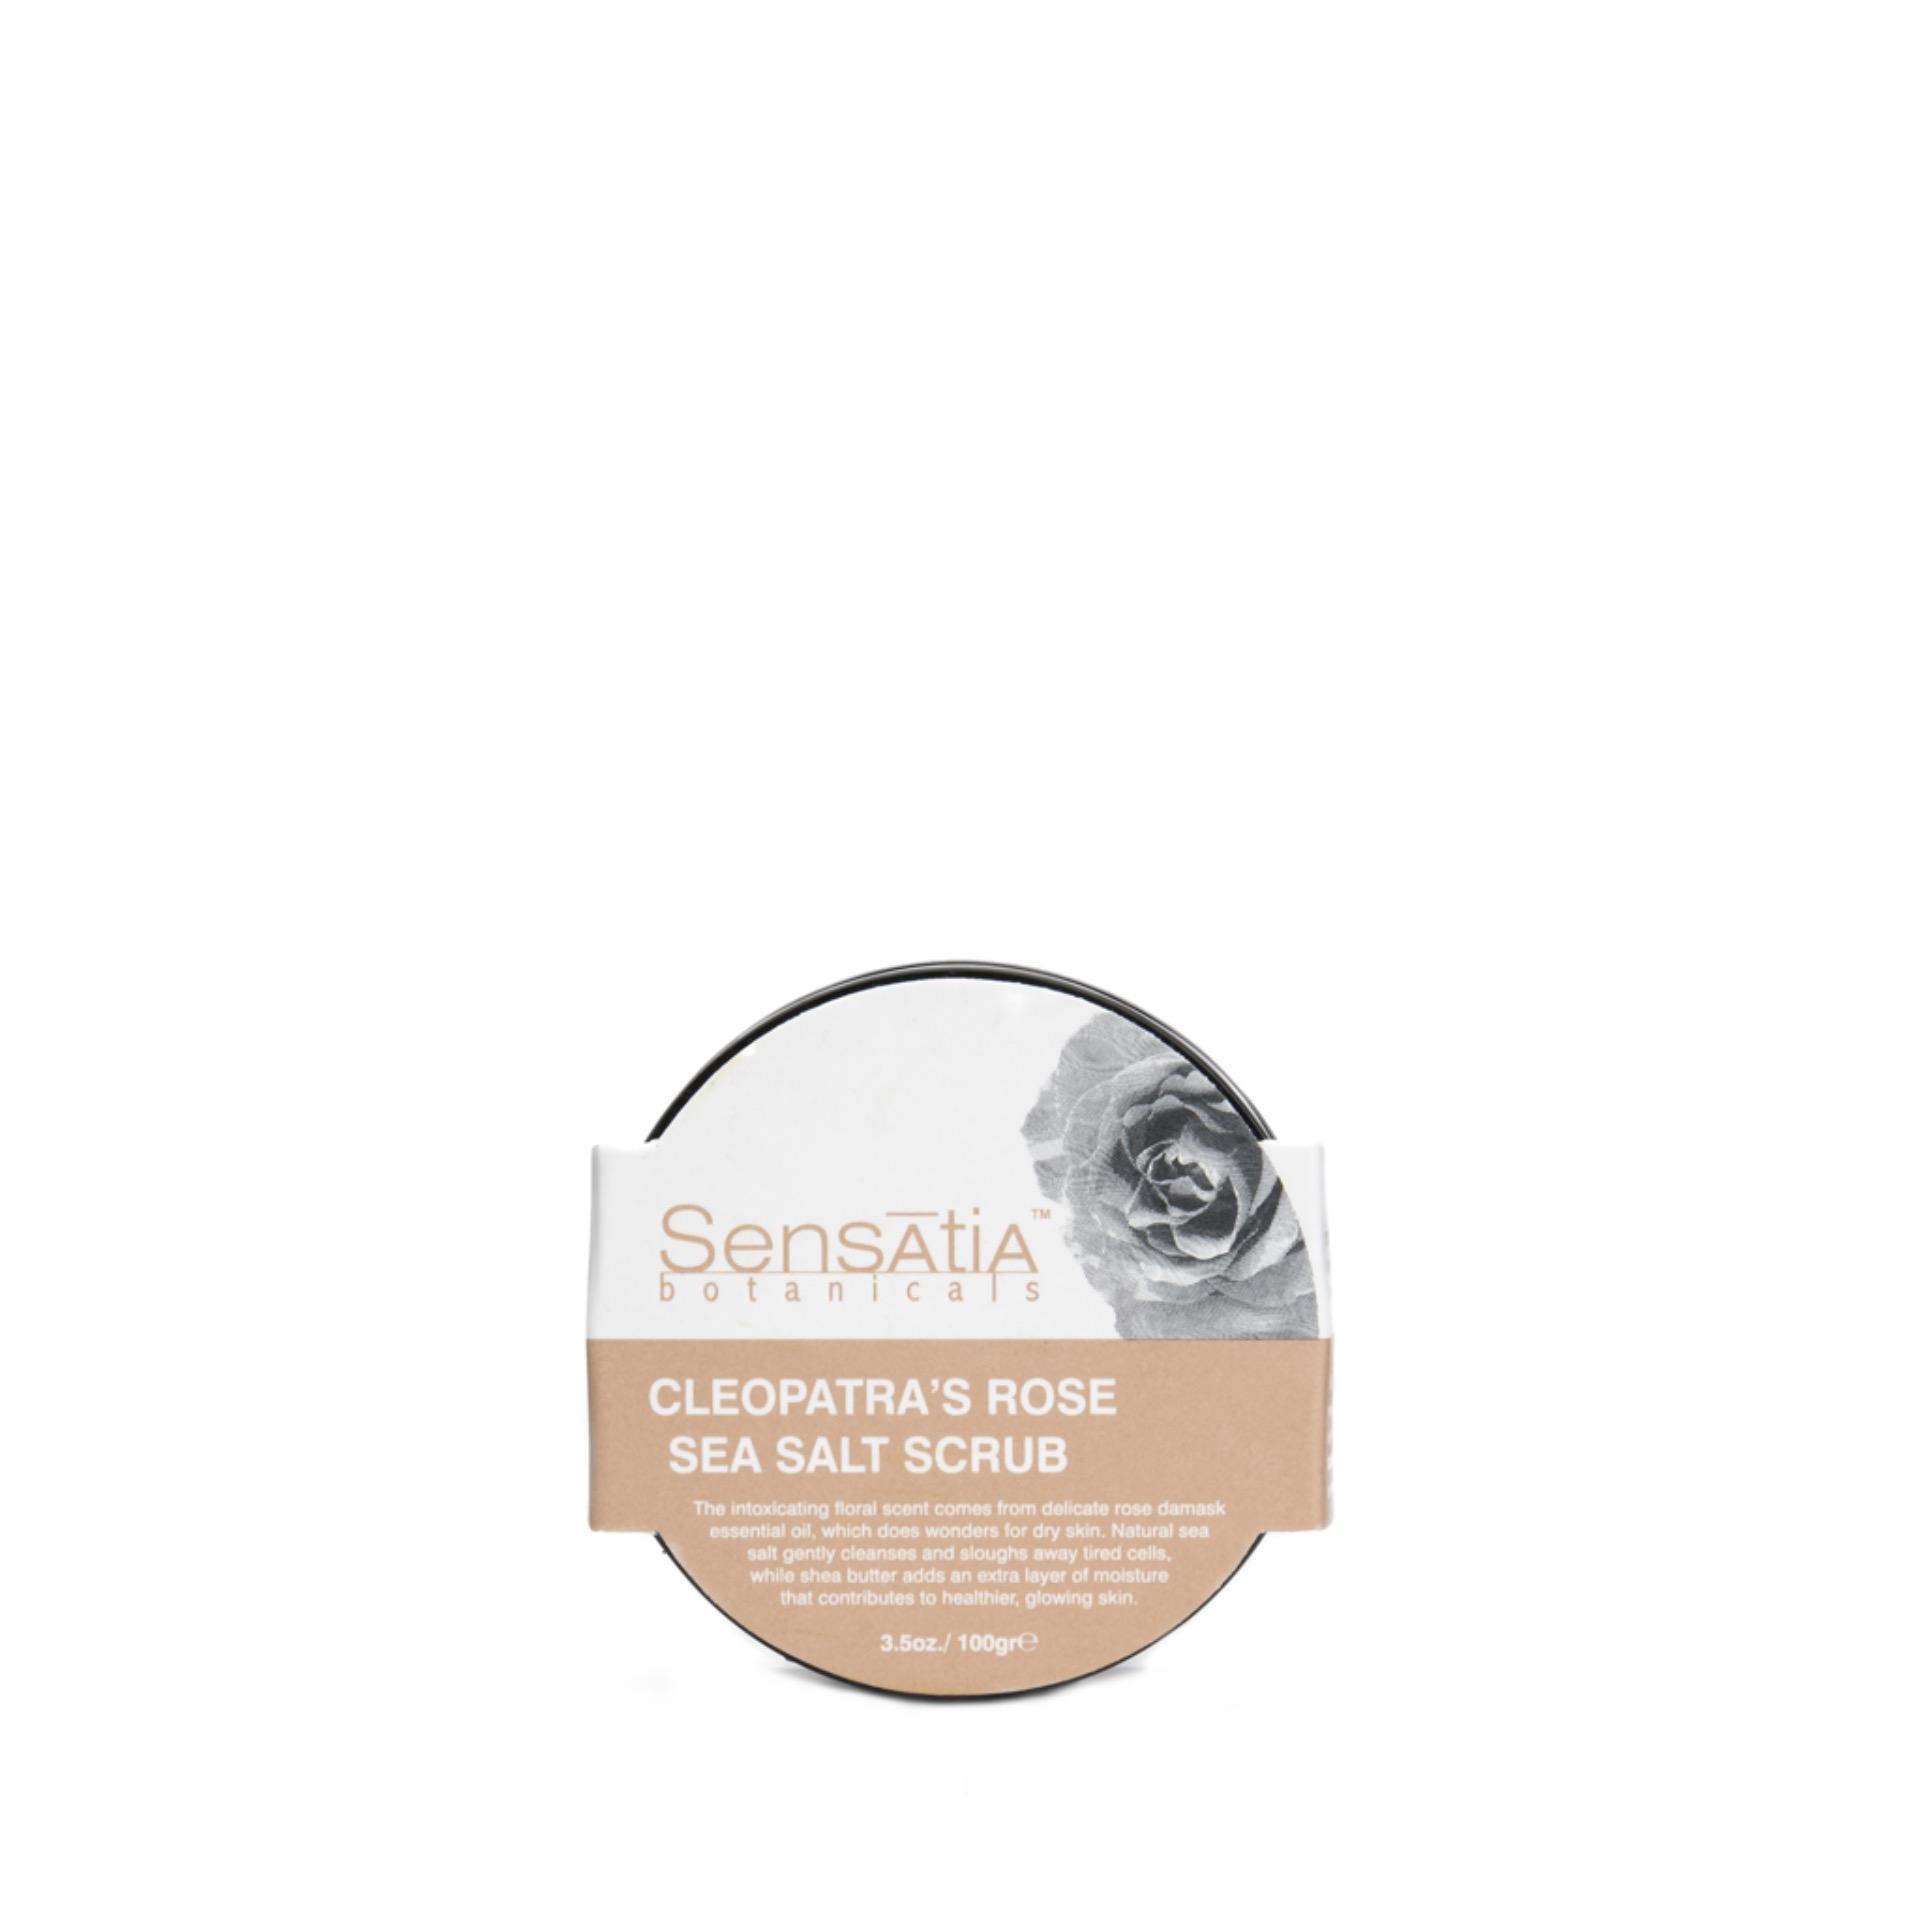 Sensatia Botanicals Natural Facial Cleanser Cleopatras Rose Daftar C Serum Jasmine Blossom 60 Ml Gambar Produk Rinci Sea Salt Scrub 100 Gr Terkini